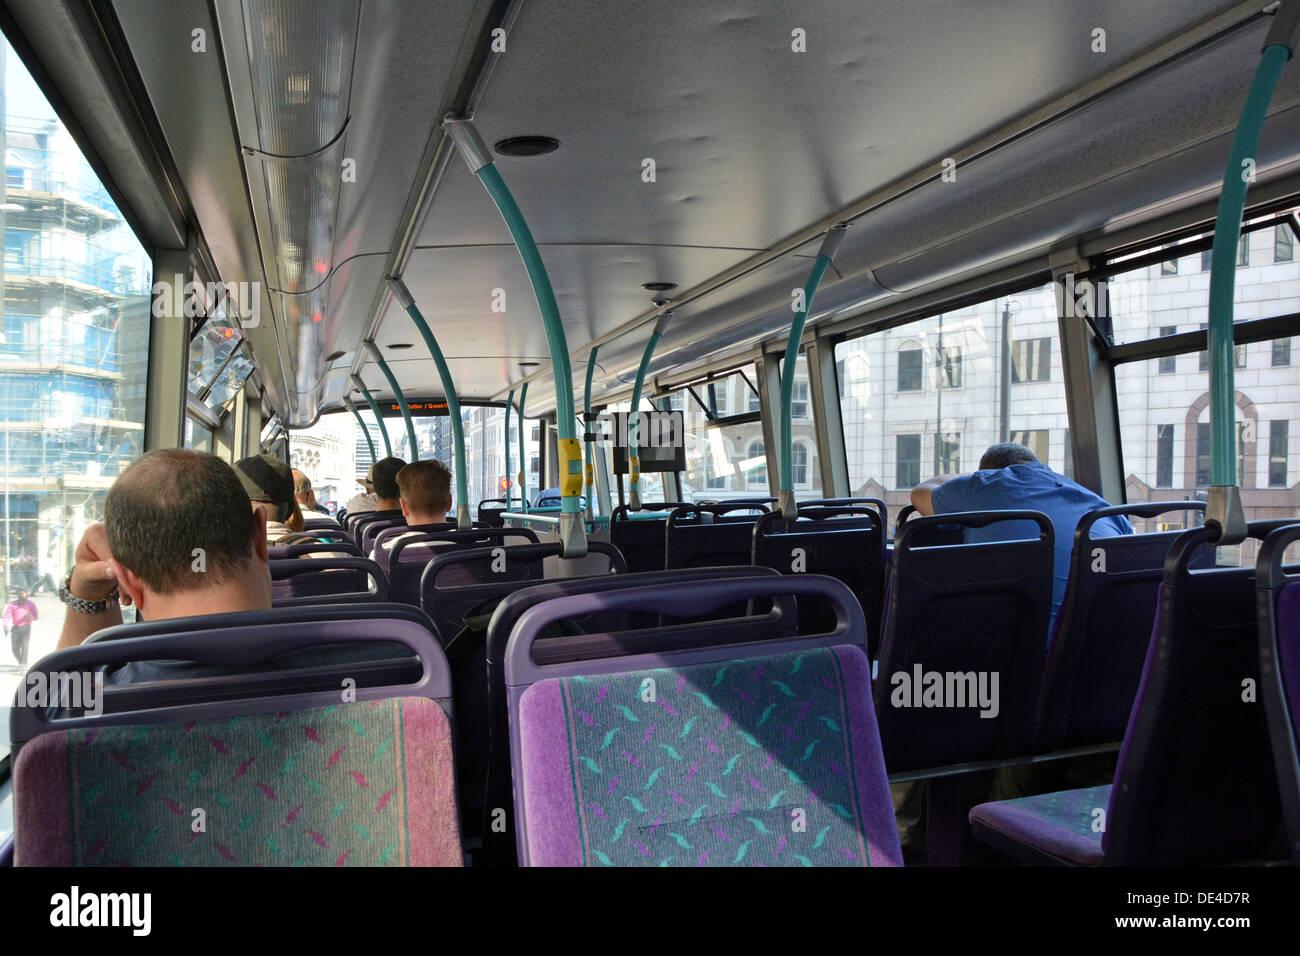 London Doppeldecker Bus Interieur mit Passagieren Stockfoto, Bild ...